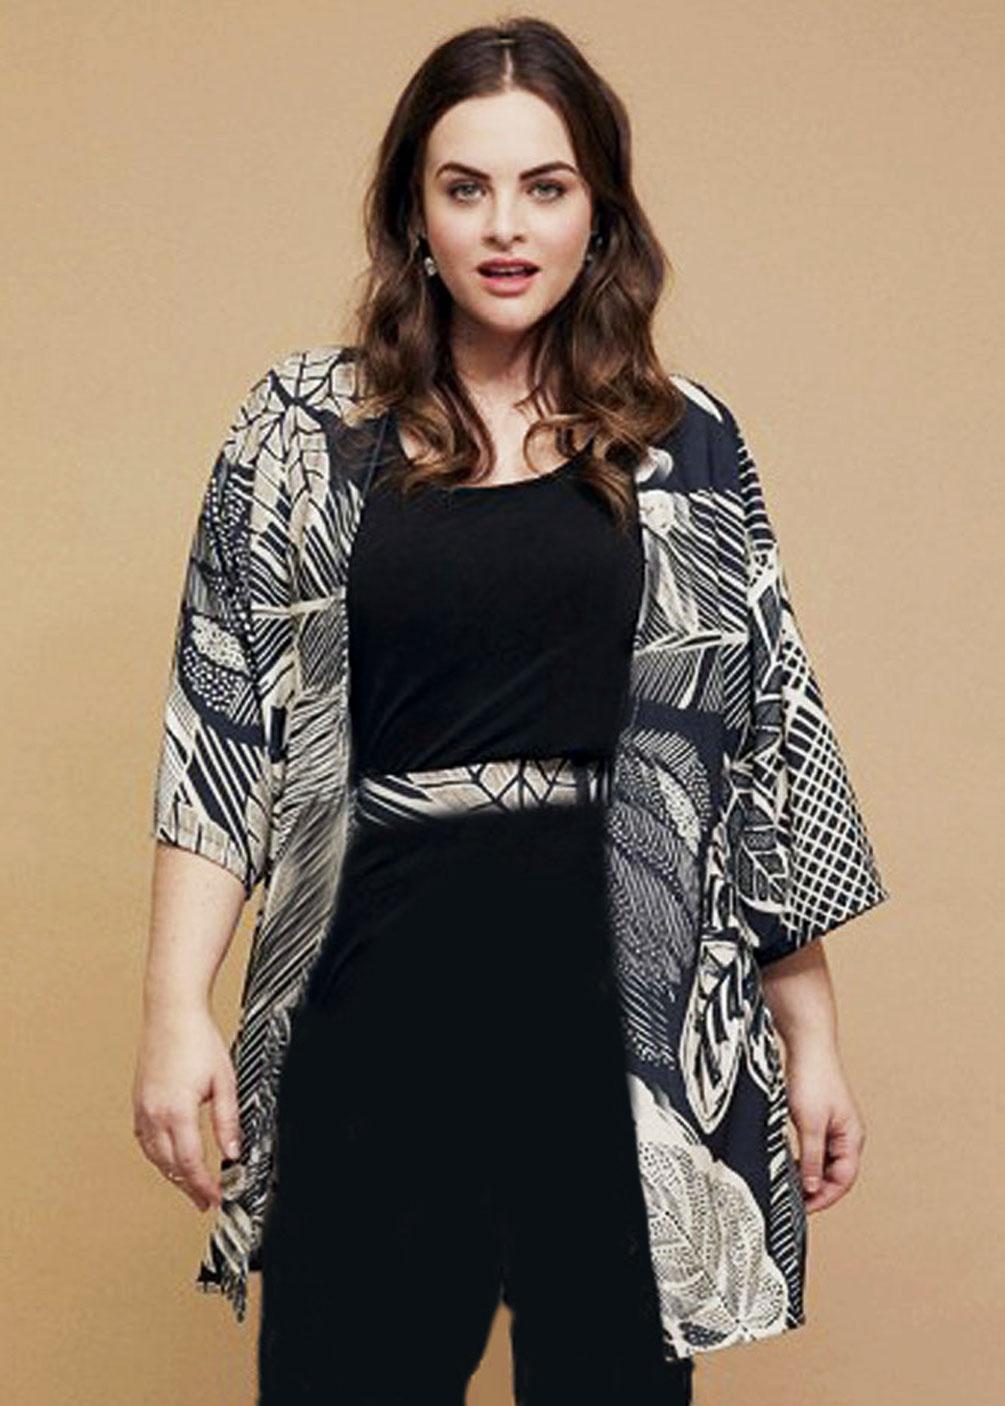 kimono guardapolvos chaqueta sobretodo tallas grandes verano 2021